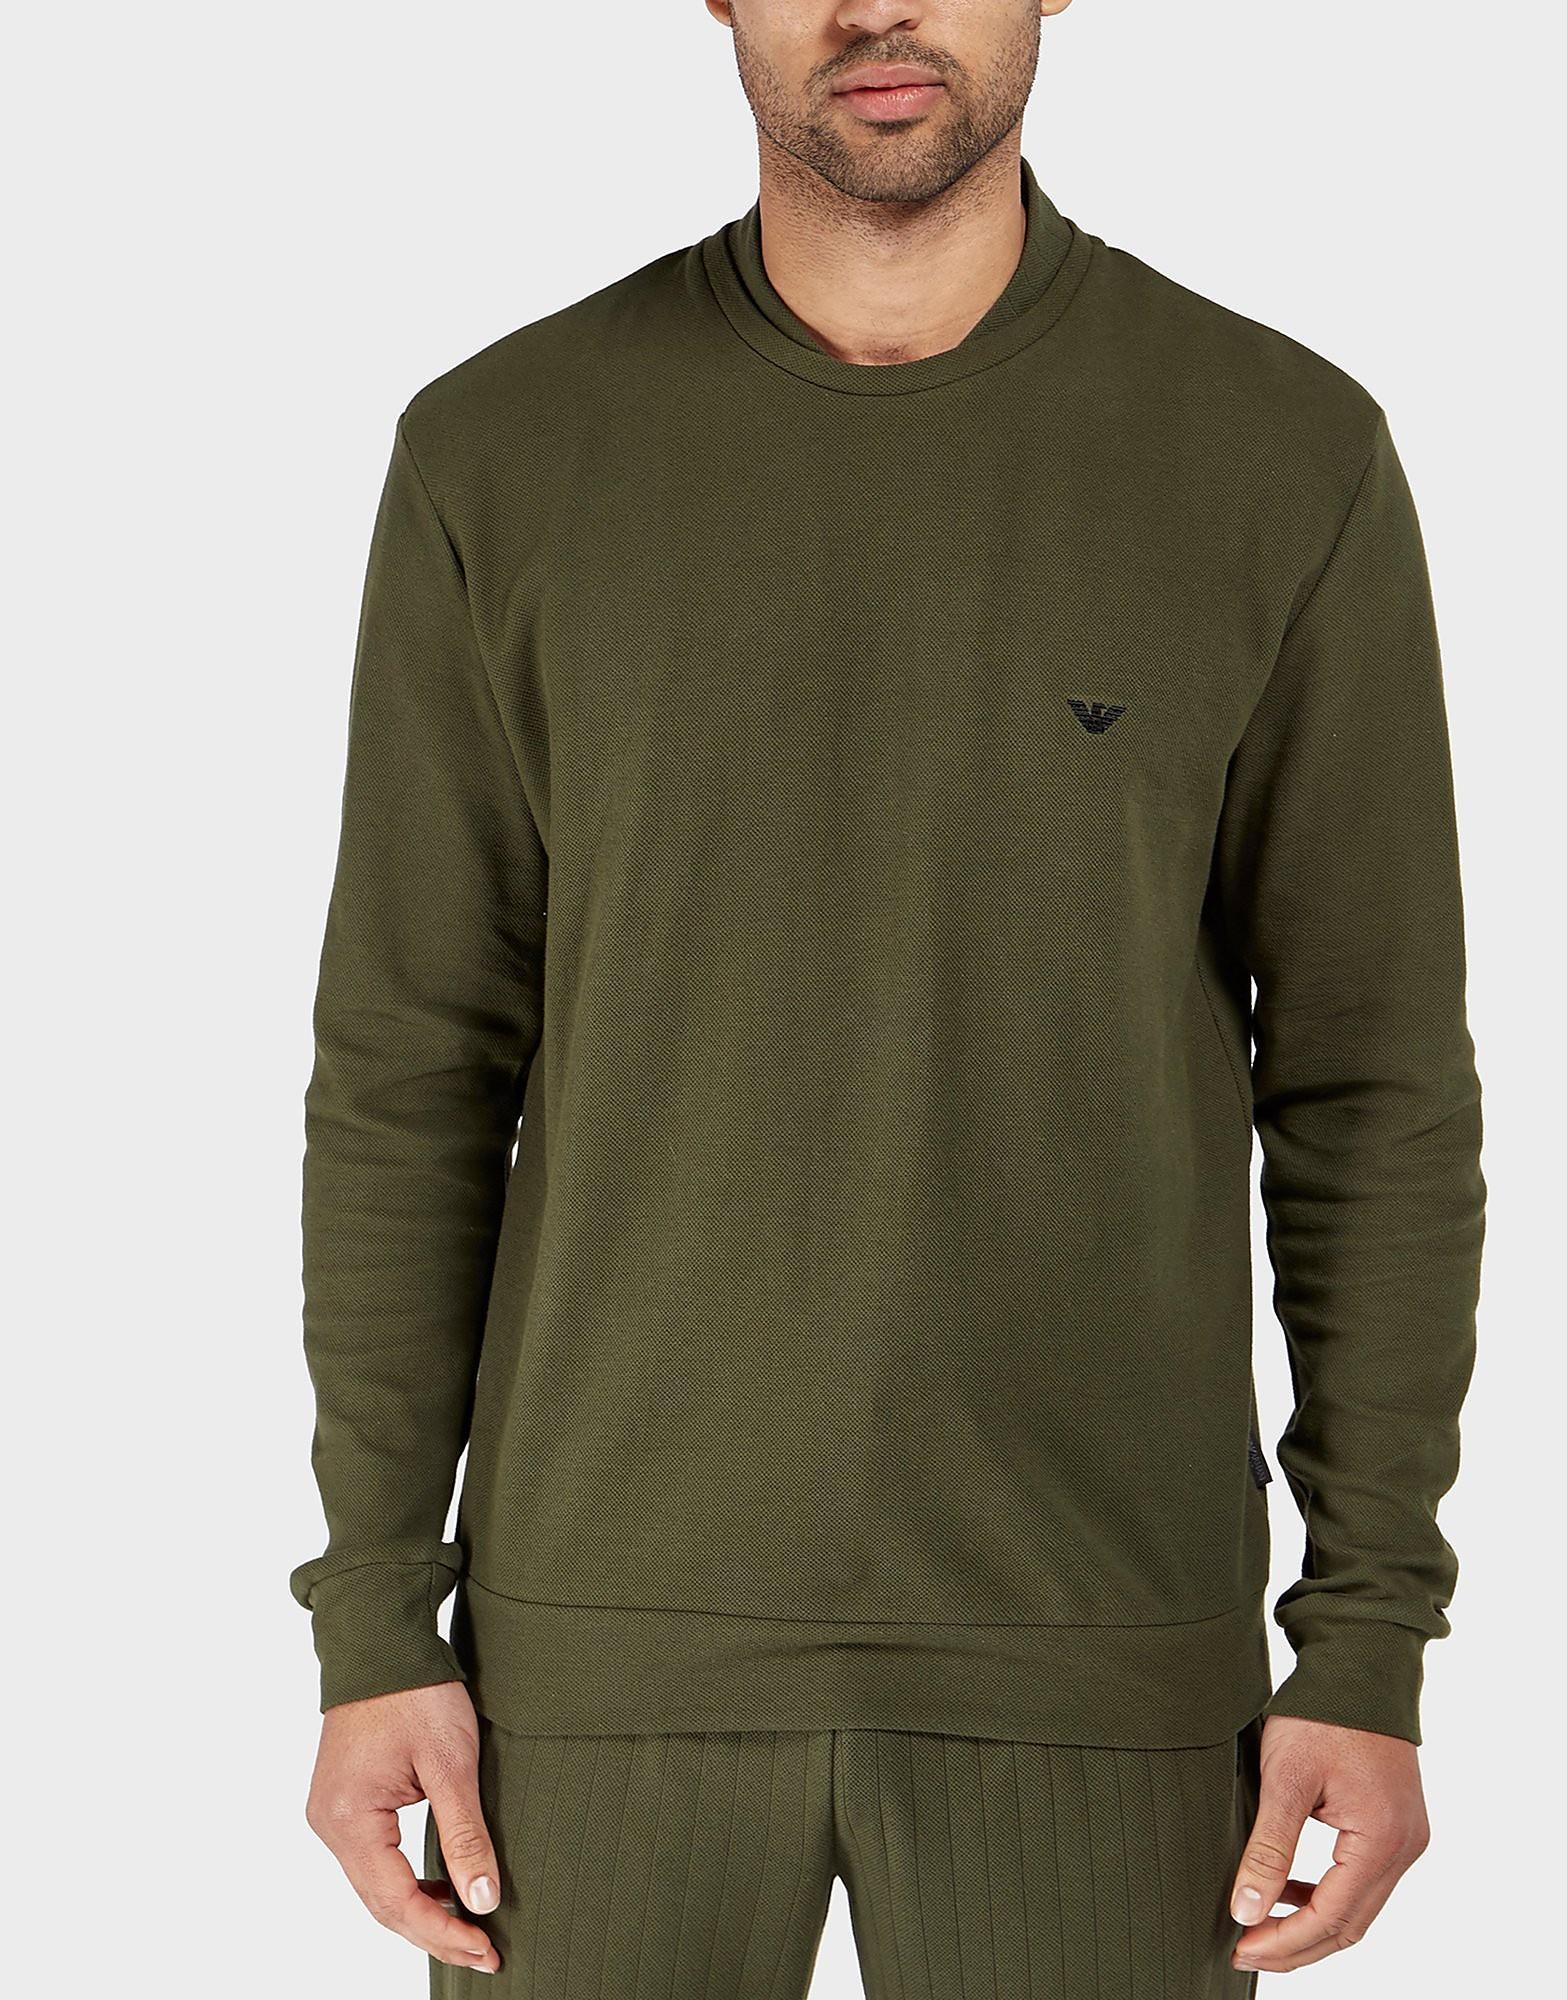 Emporio Armani Interlock Crew Sweatshirt